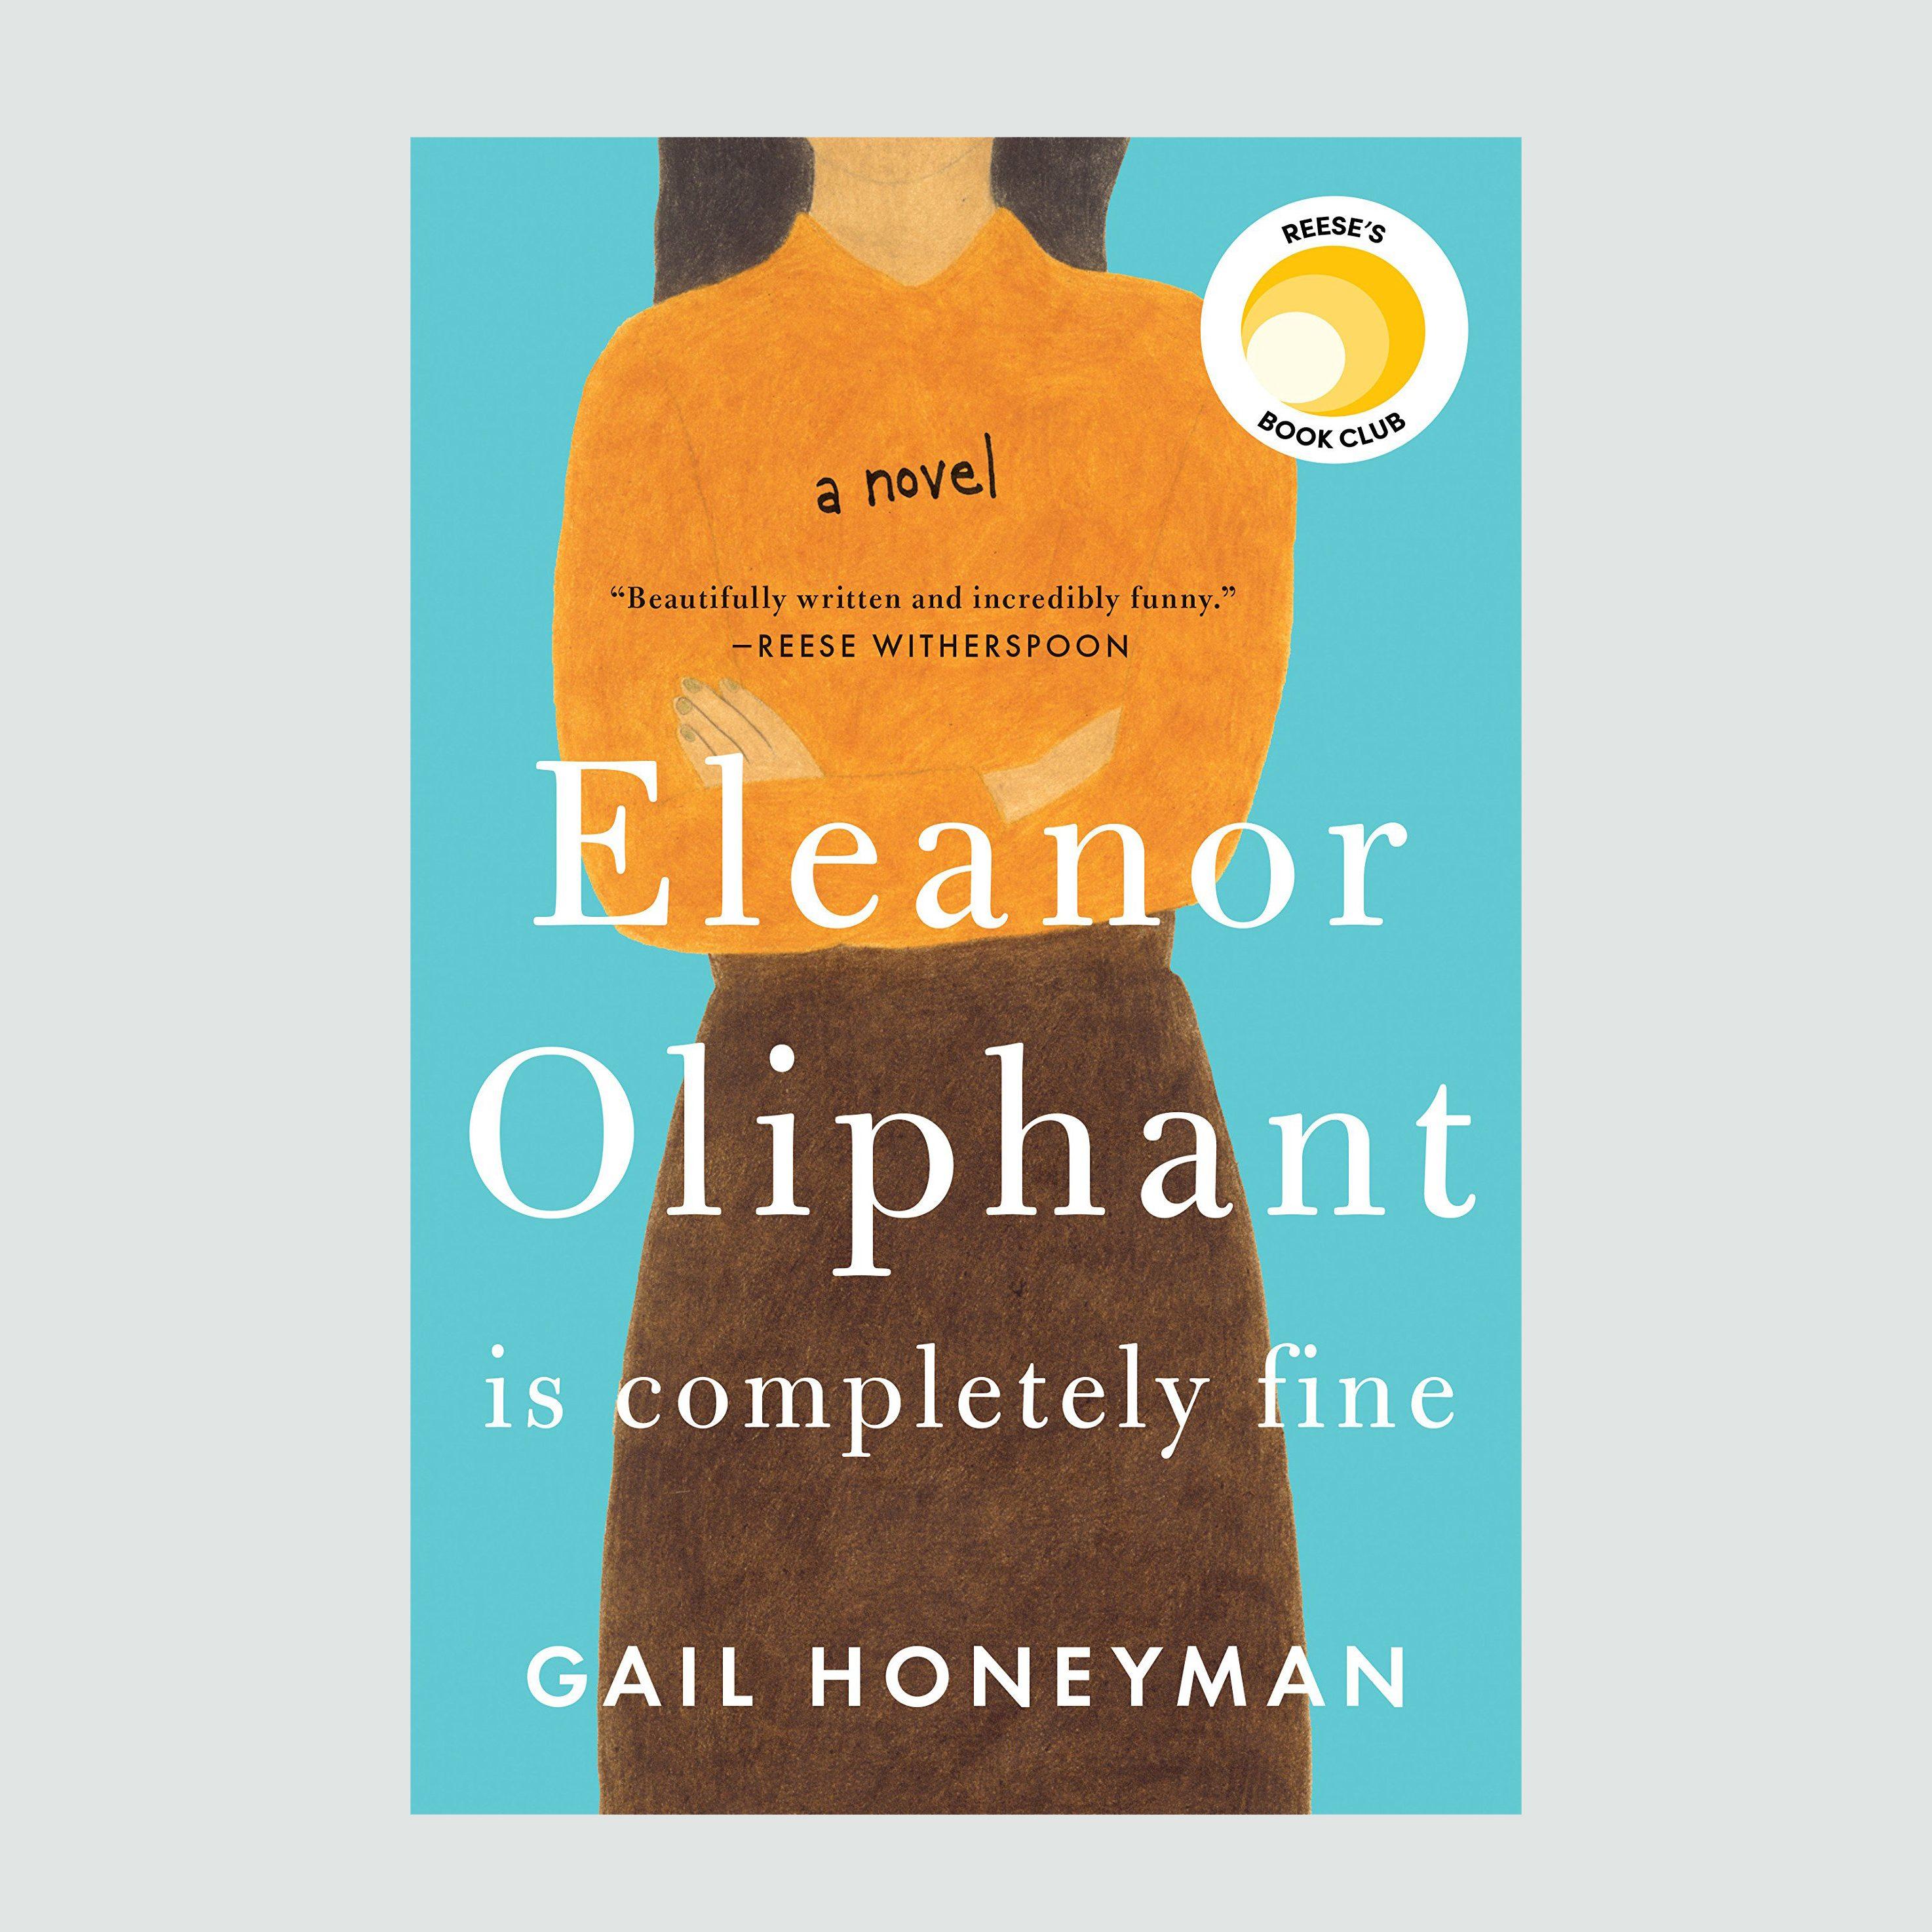 eleanor oliphant book